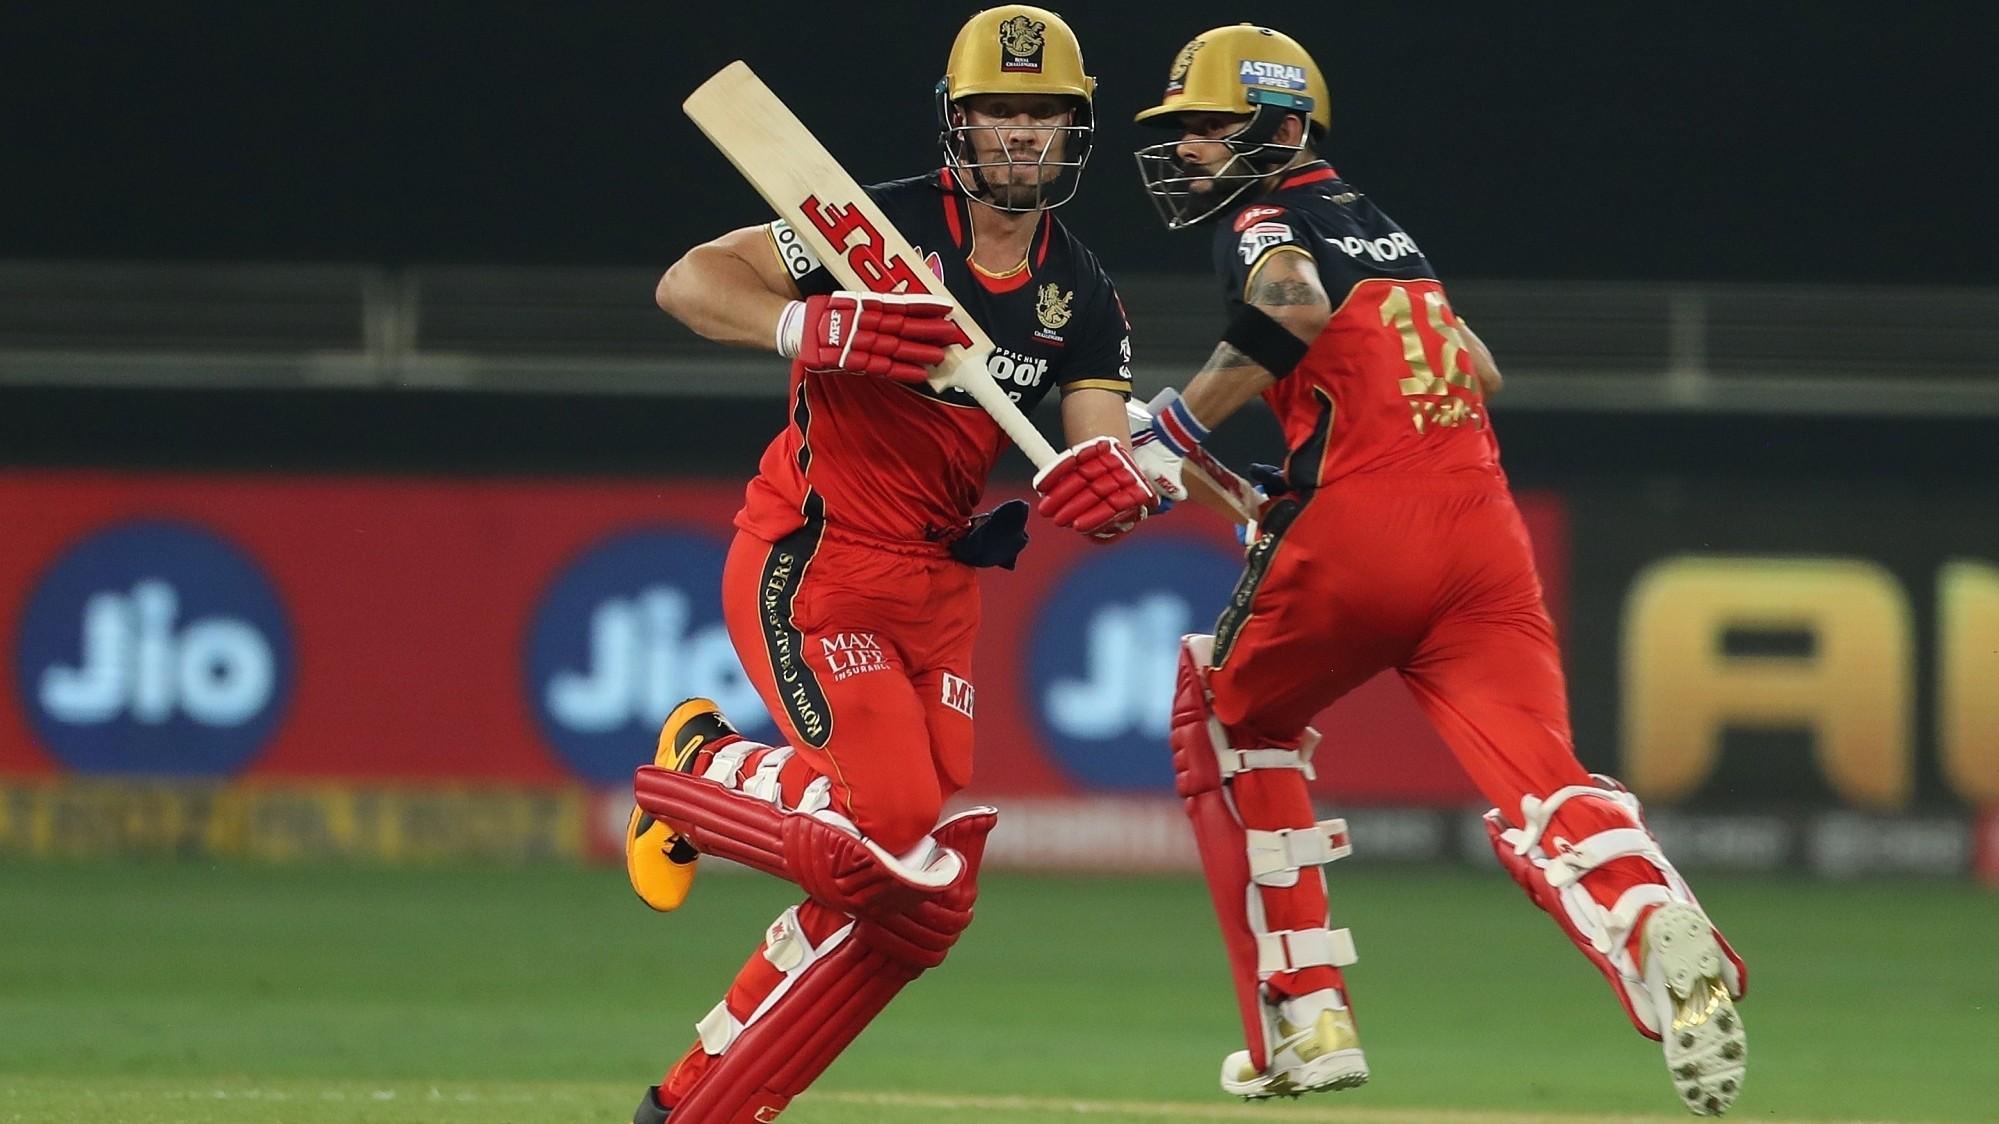 IPL 2020: 'Barring one super-human, everyone struggled on that pitch' – Virat Kohli lauds AB de Villiers